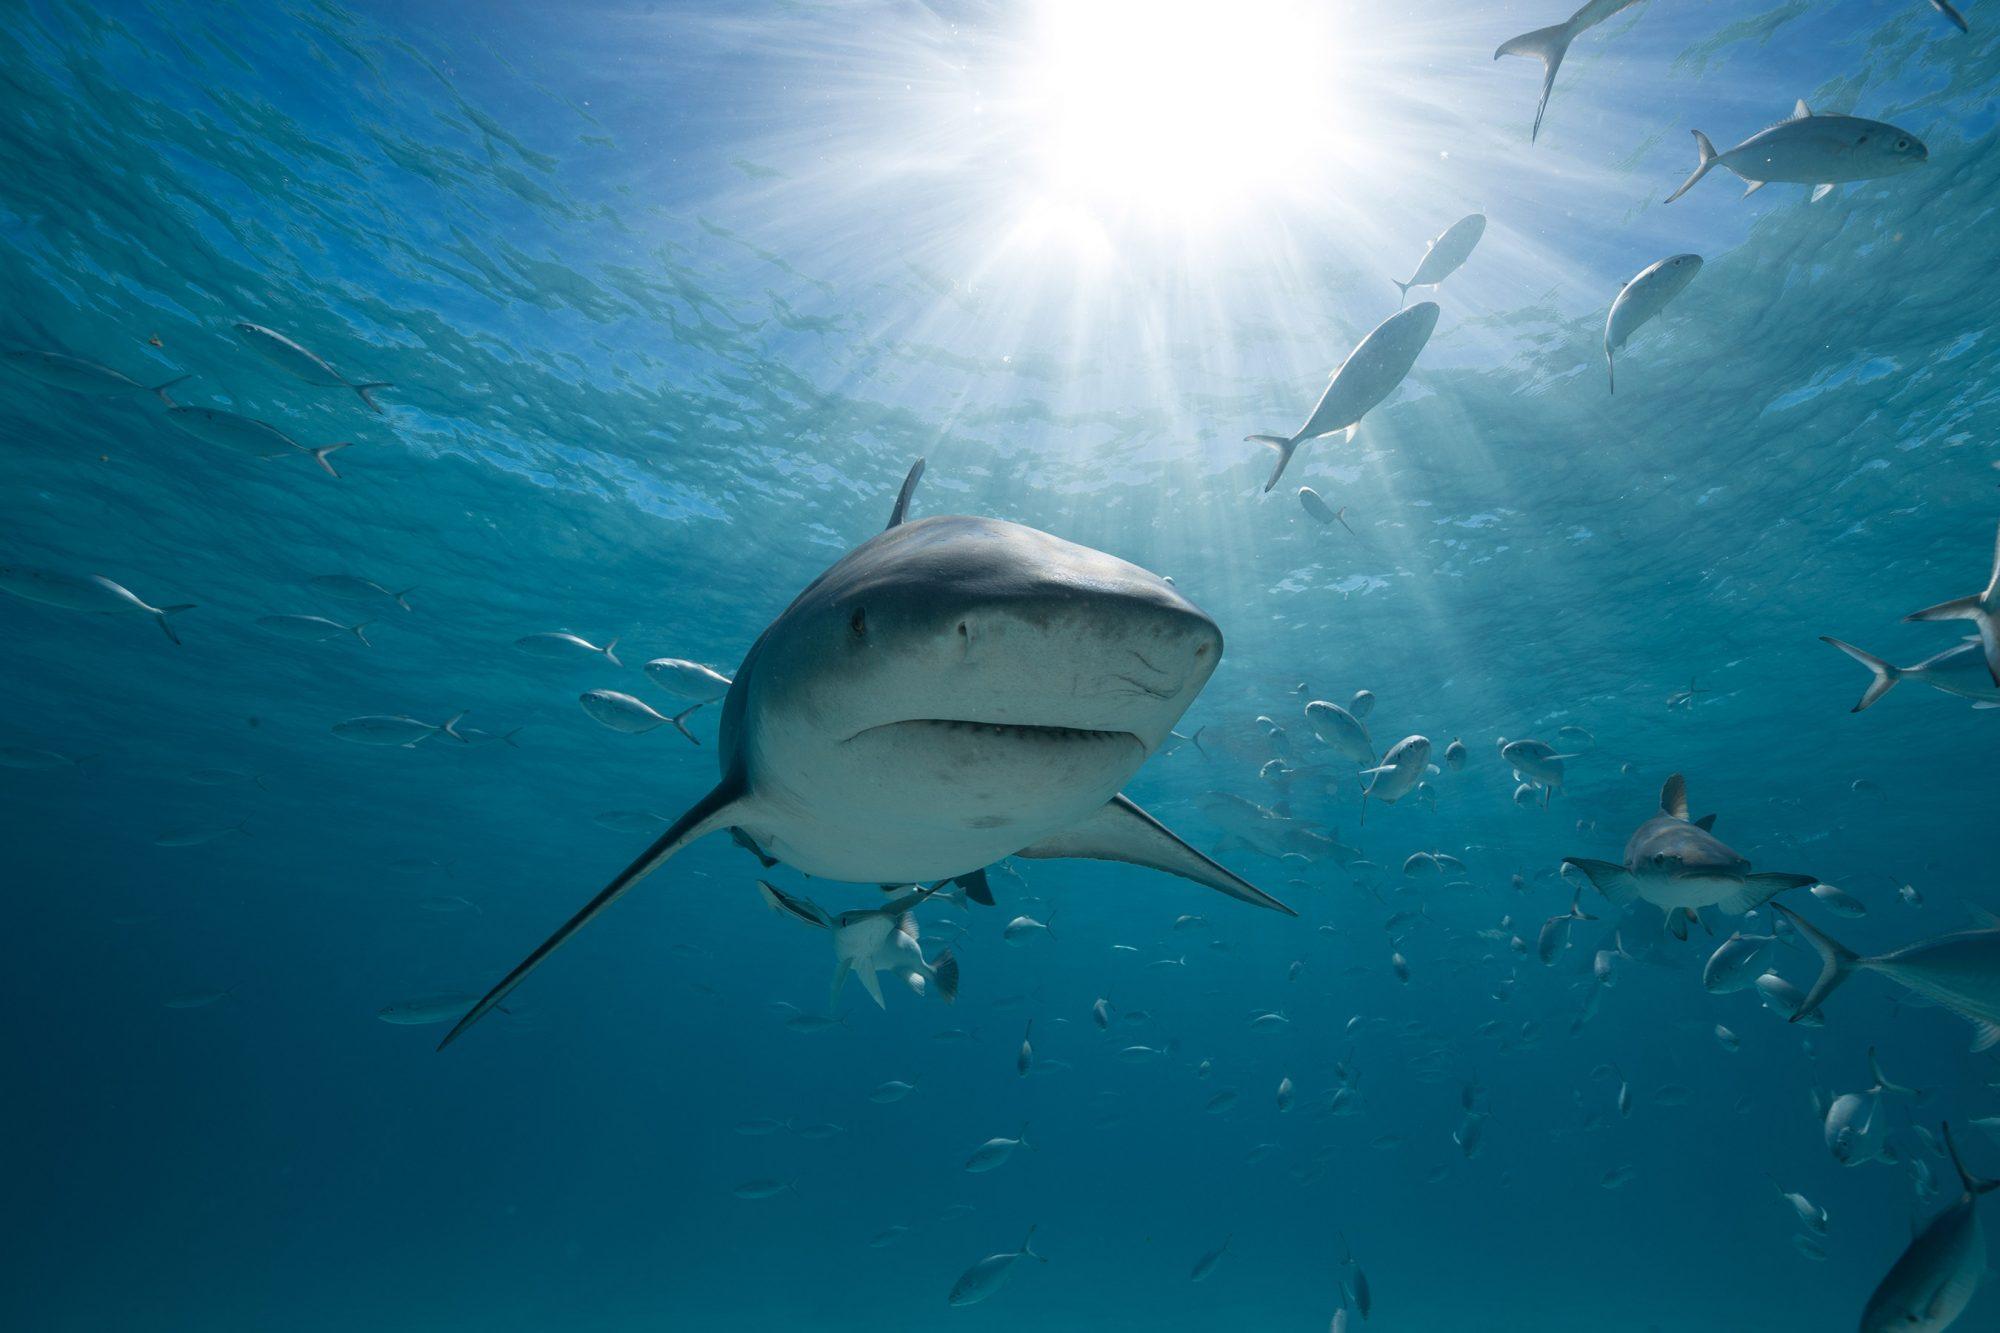 SHARKS GONE WILD 2 - GENERIC SHARK PHOTOS